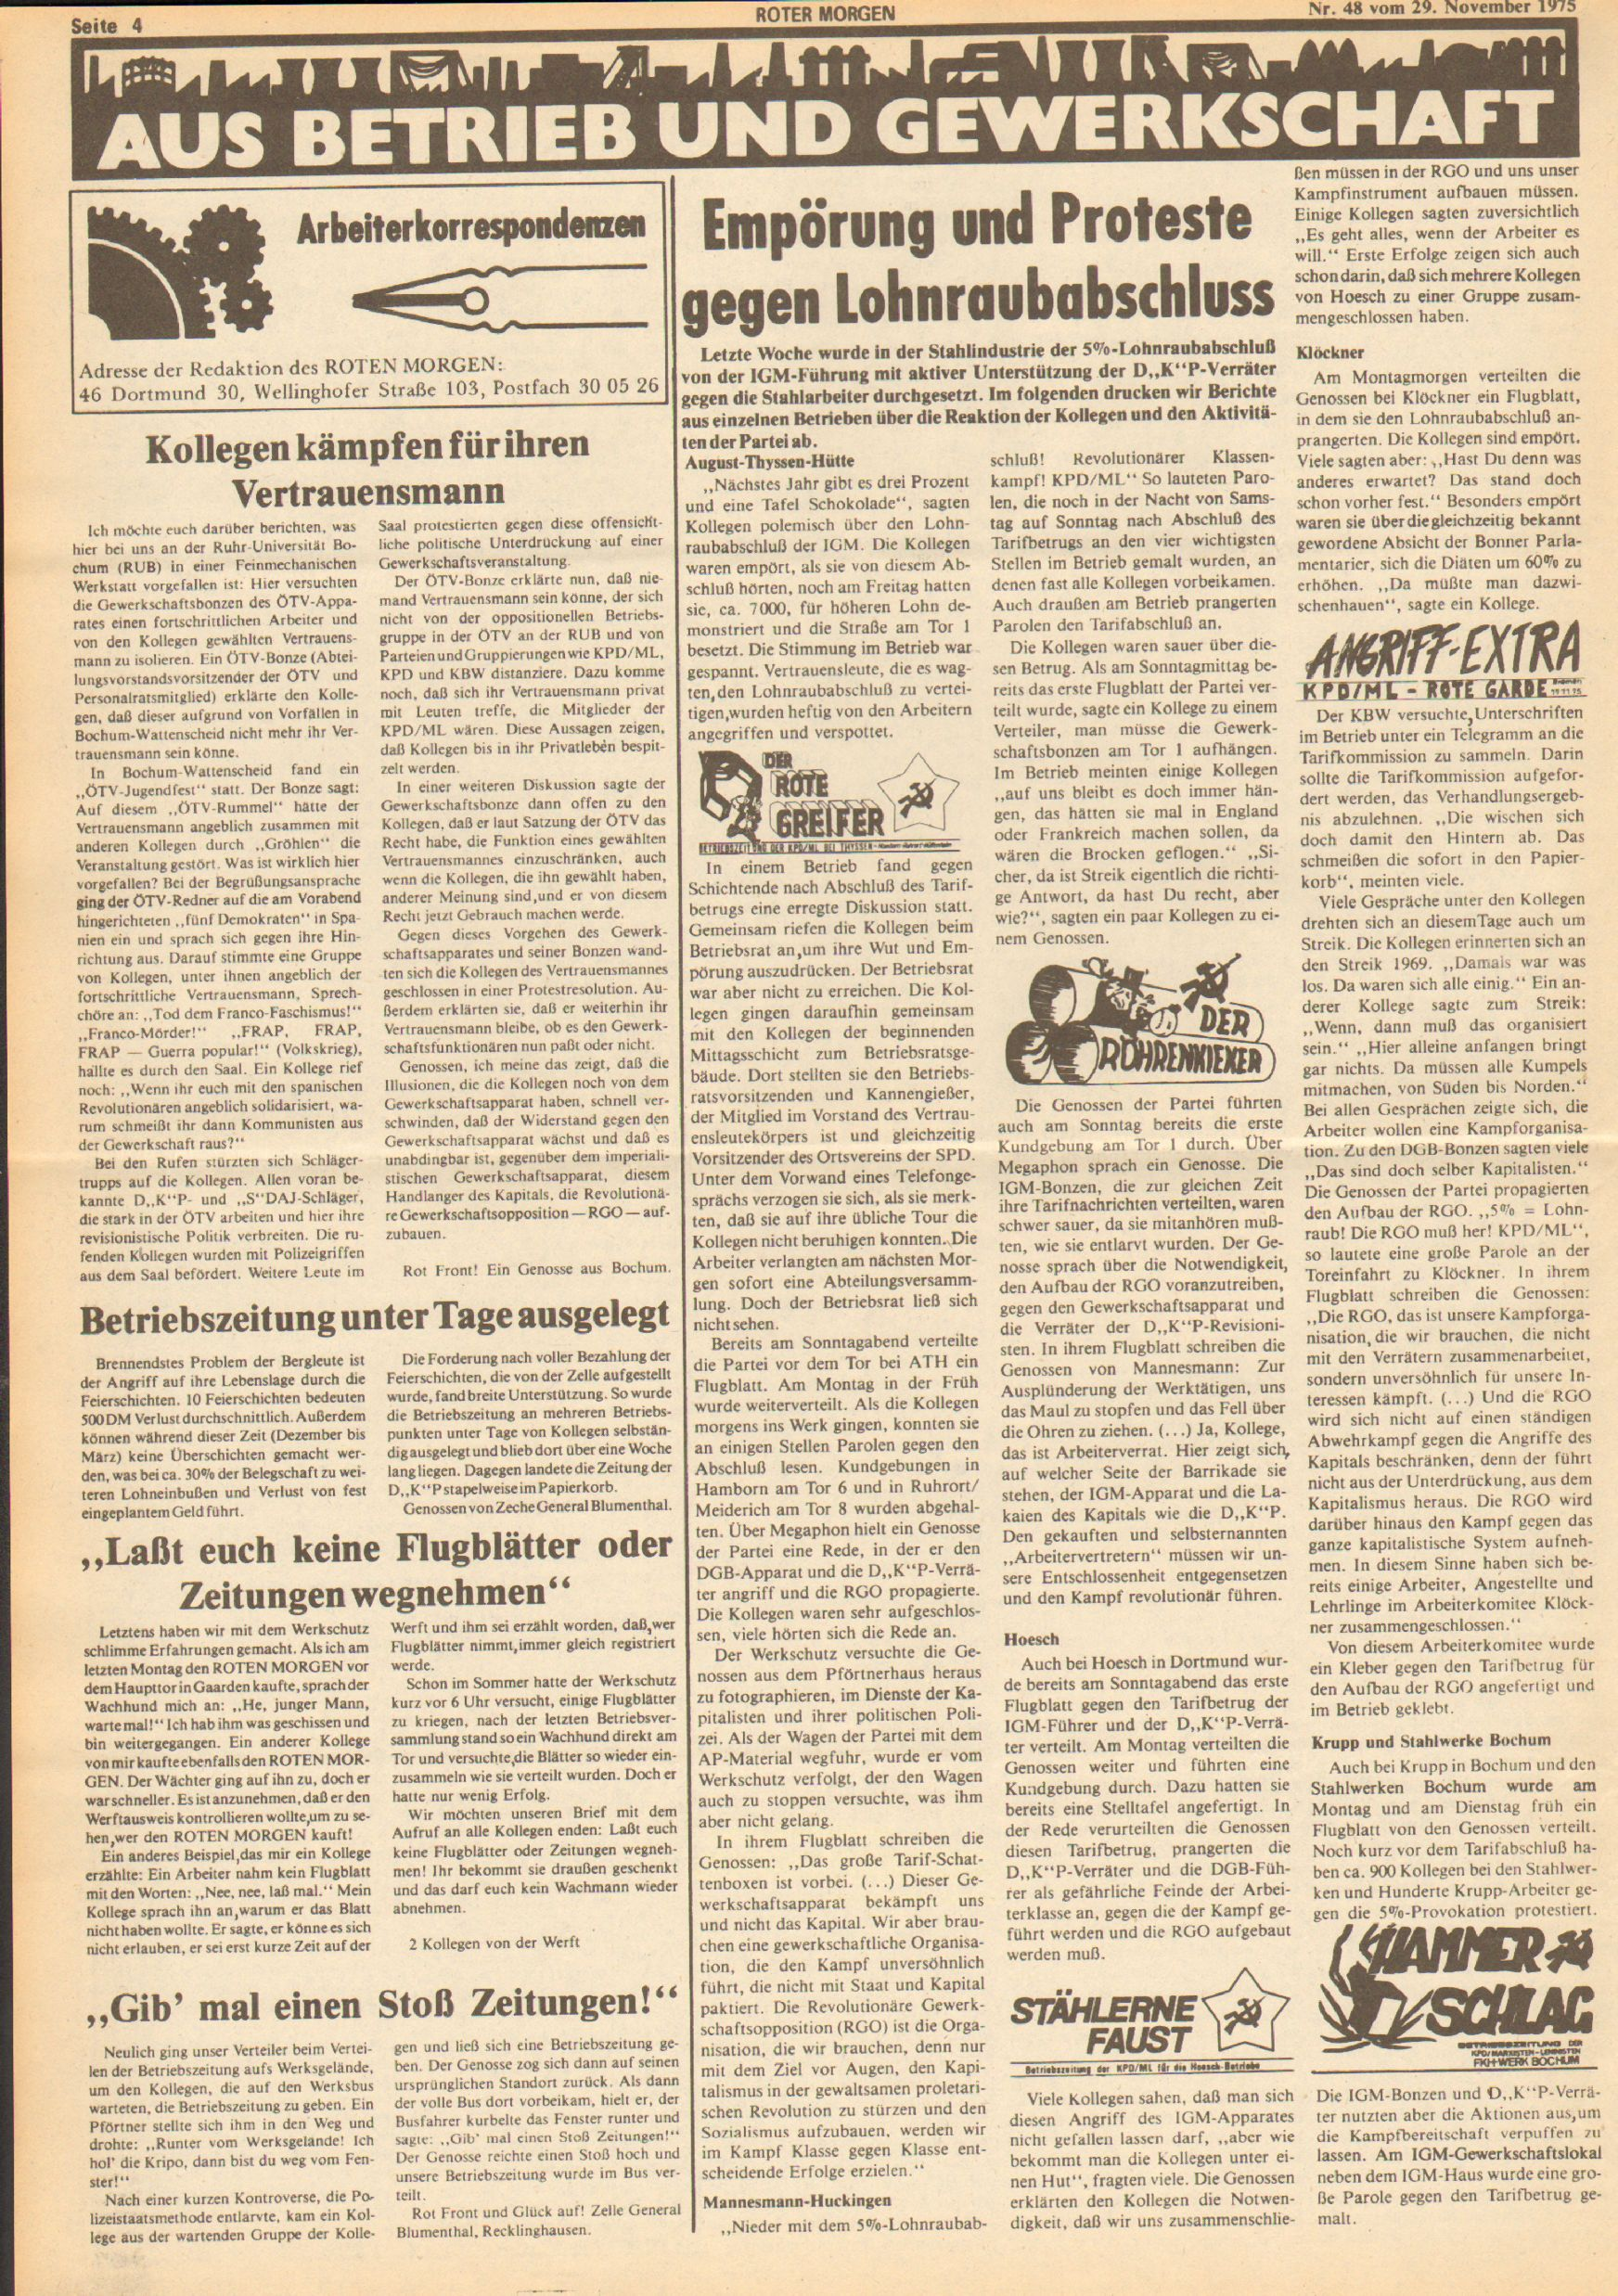 Roter Morgen, 9. Jg., 29. November 1975, Nr. 48, Seite 4